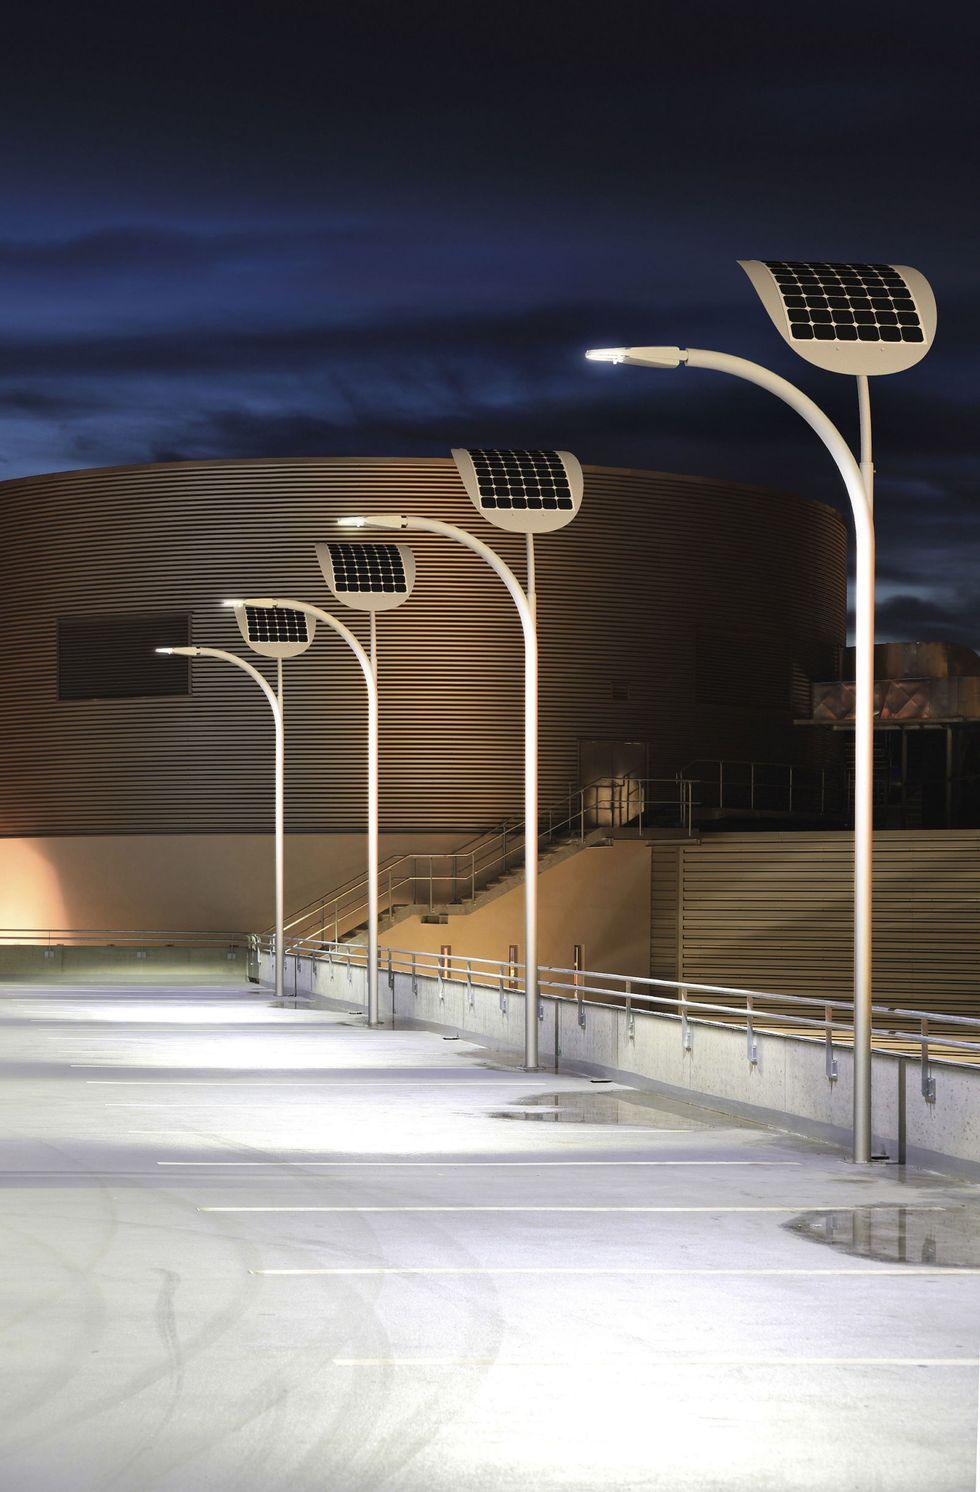 The Best Solar Street Light Manufacturers Across the World